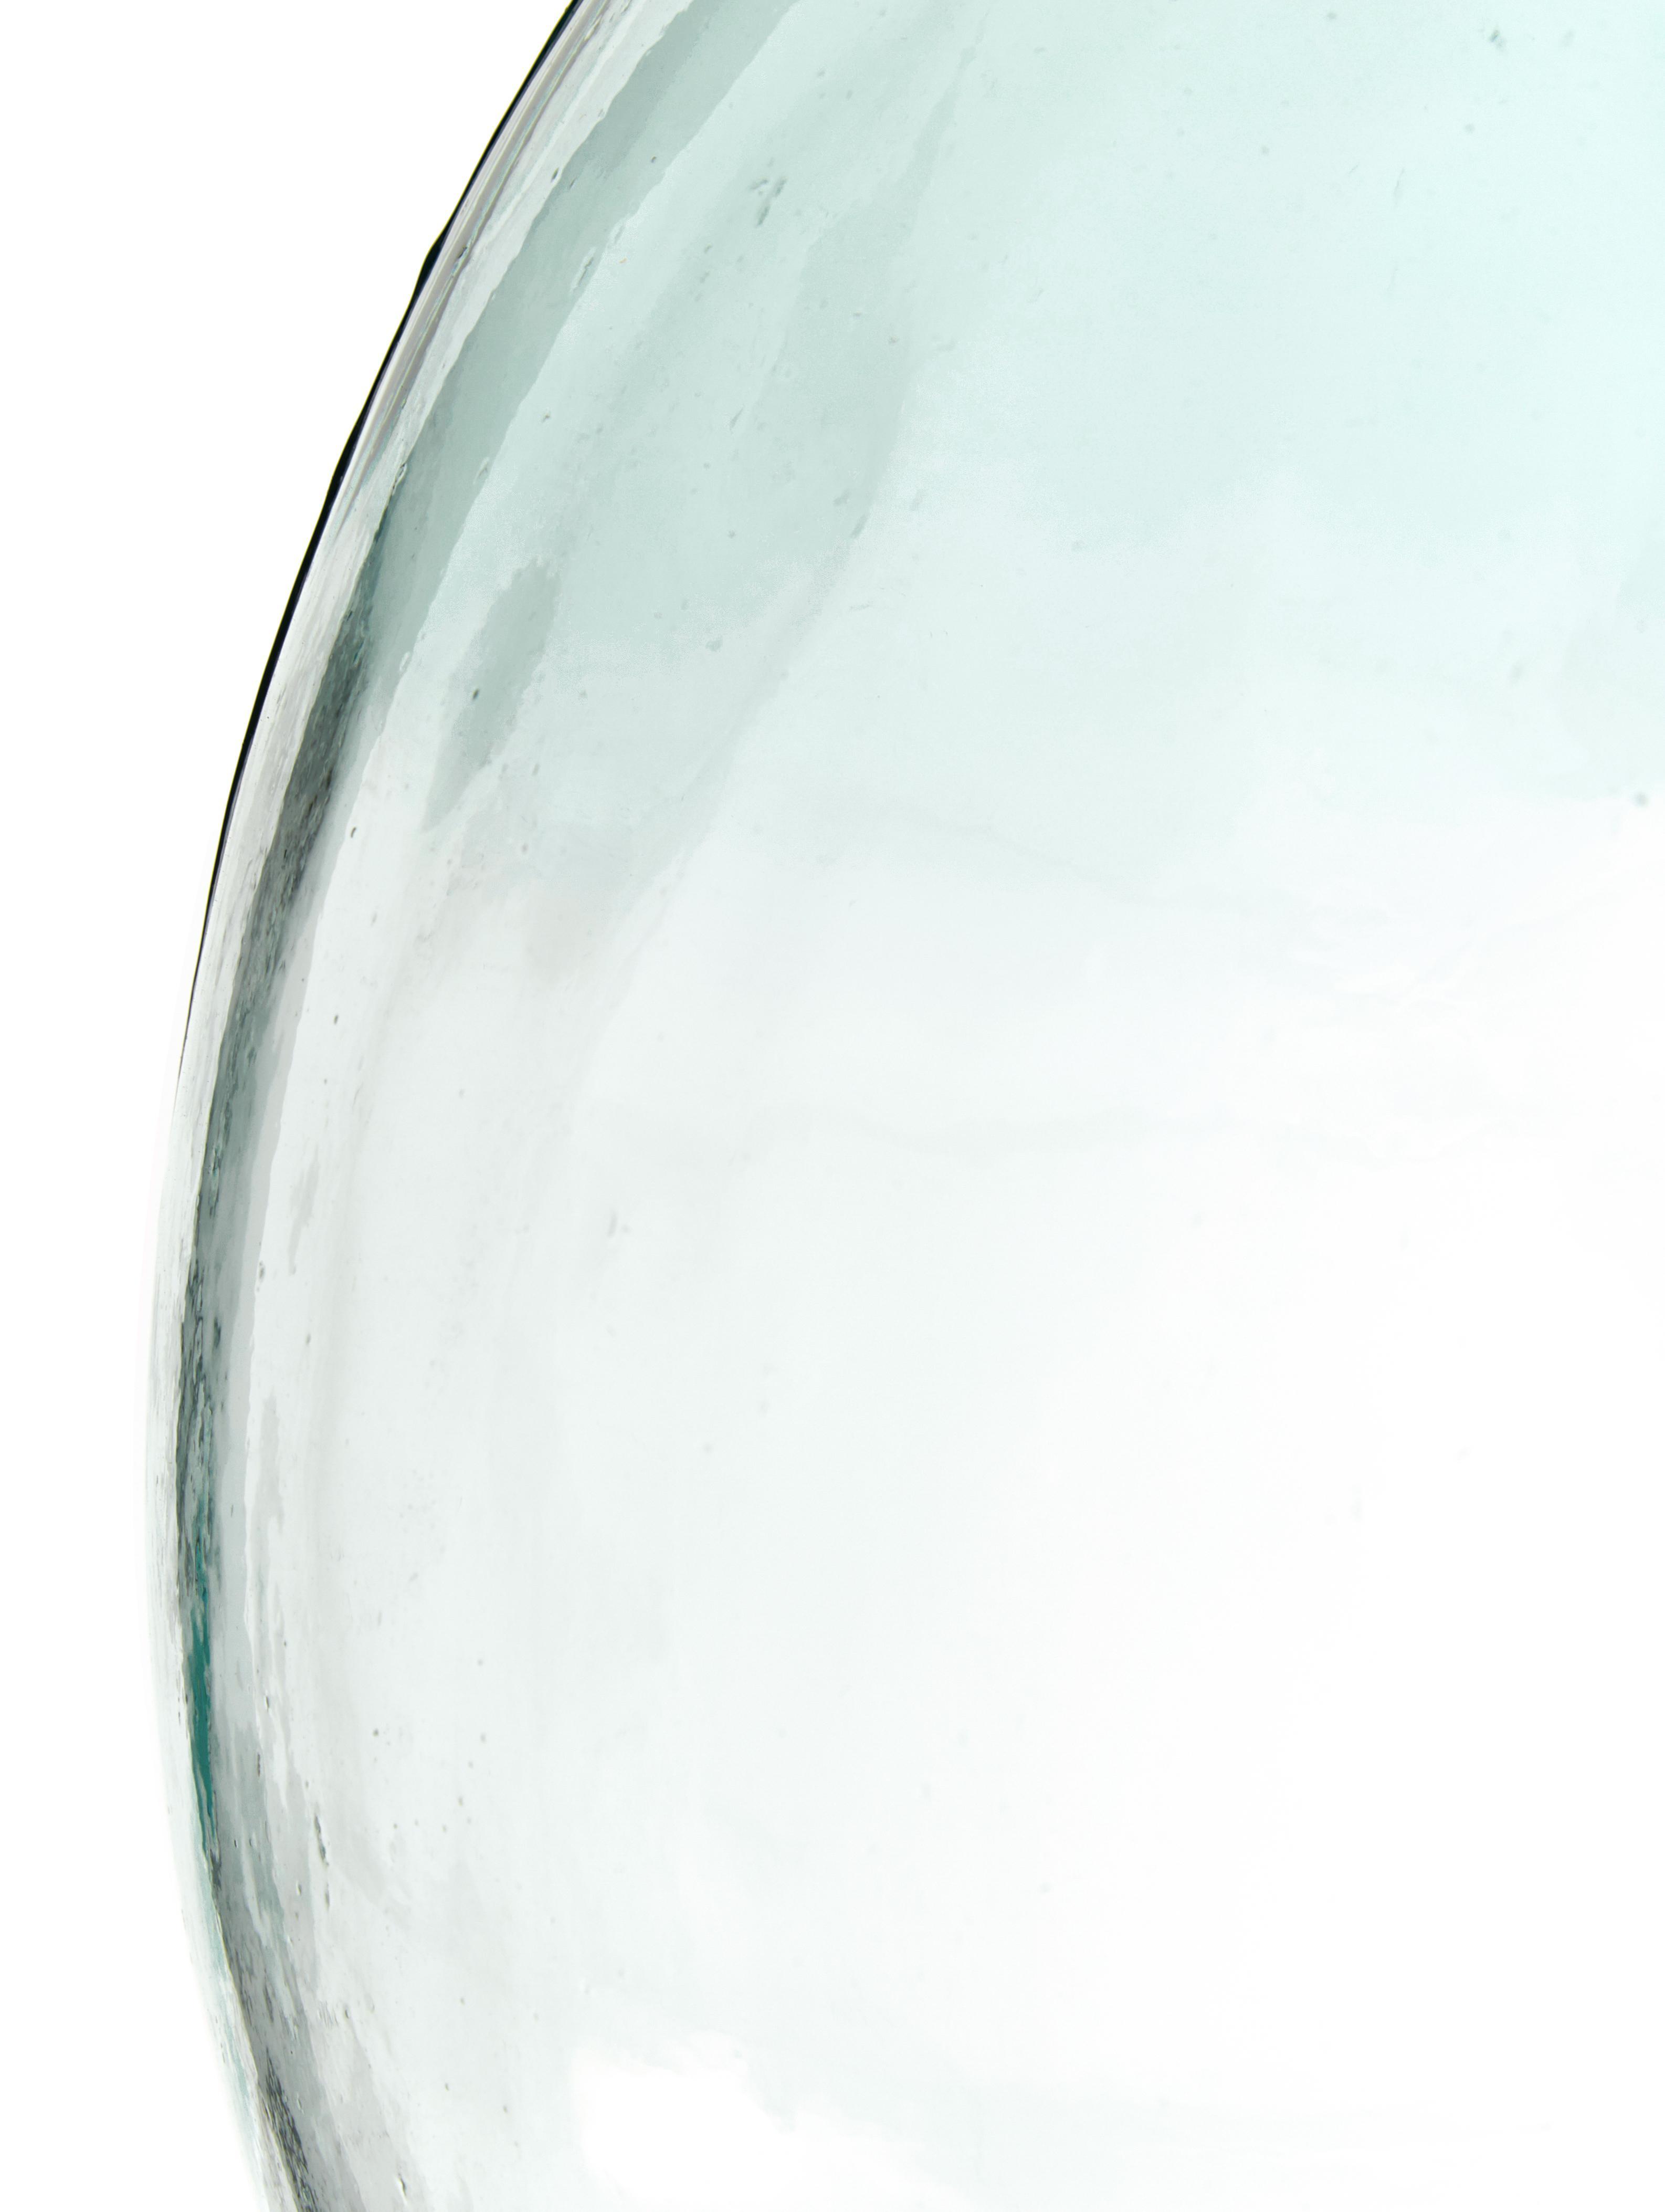 Vaso da pavimento in vetro riciclato Mikkel, Vetro riciclato, Azzurro, Alt. 56 cm